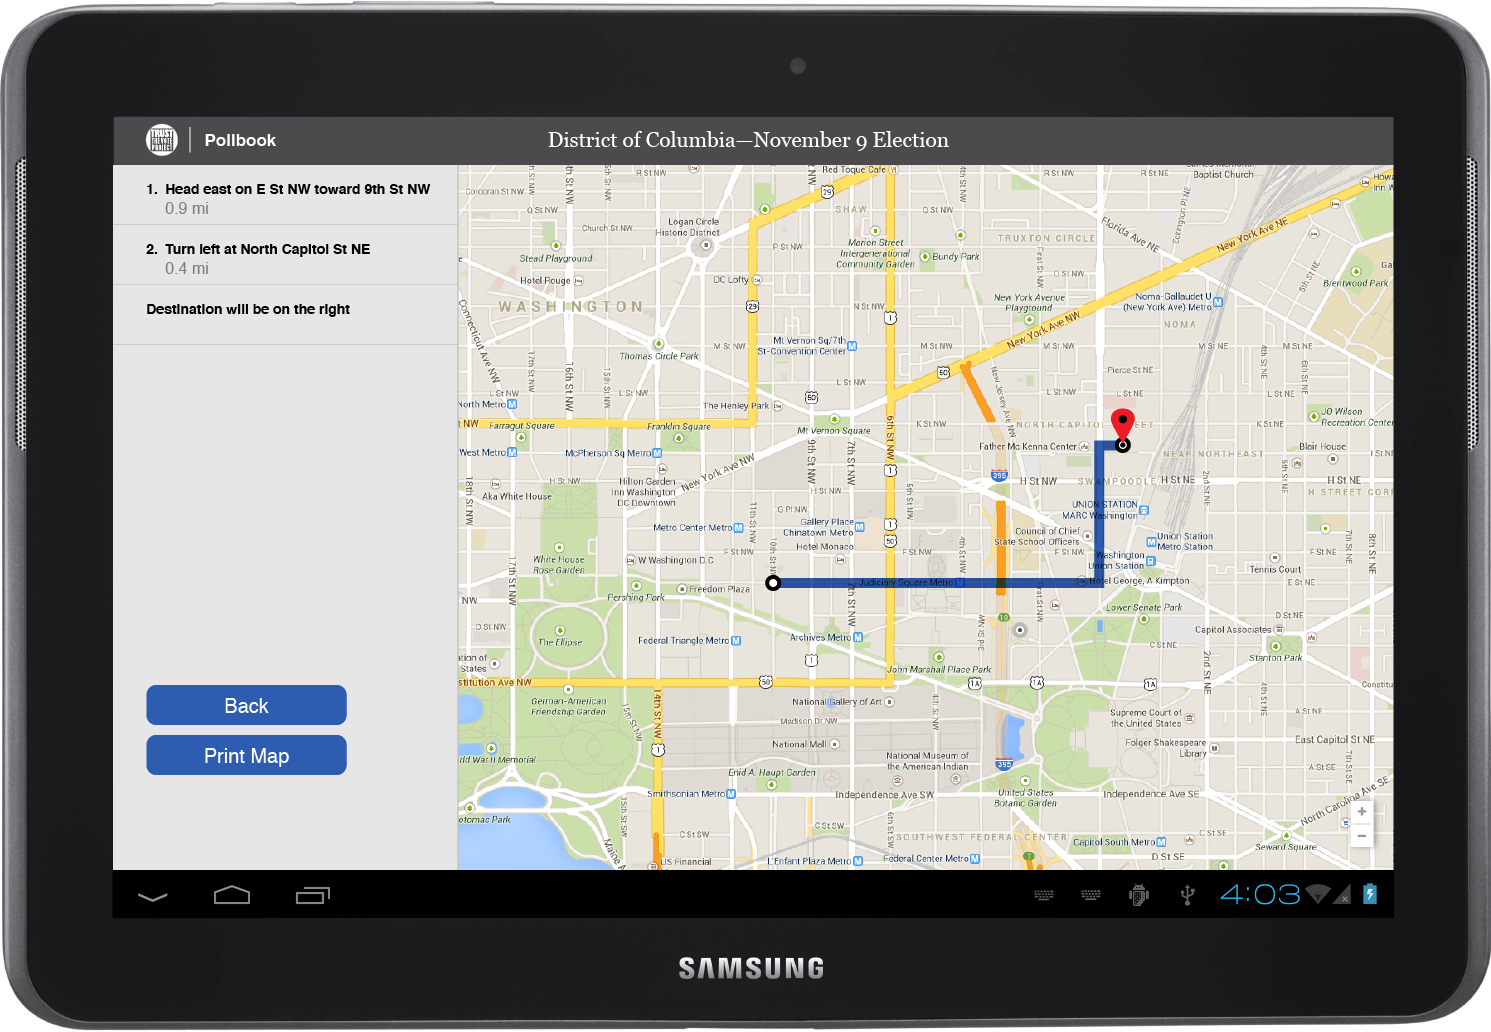 Pollbook_Samsung_Tablet_3_map.png